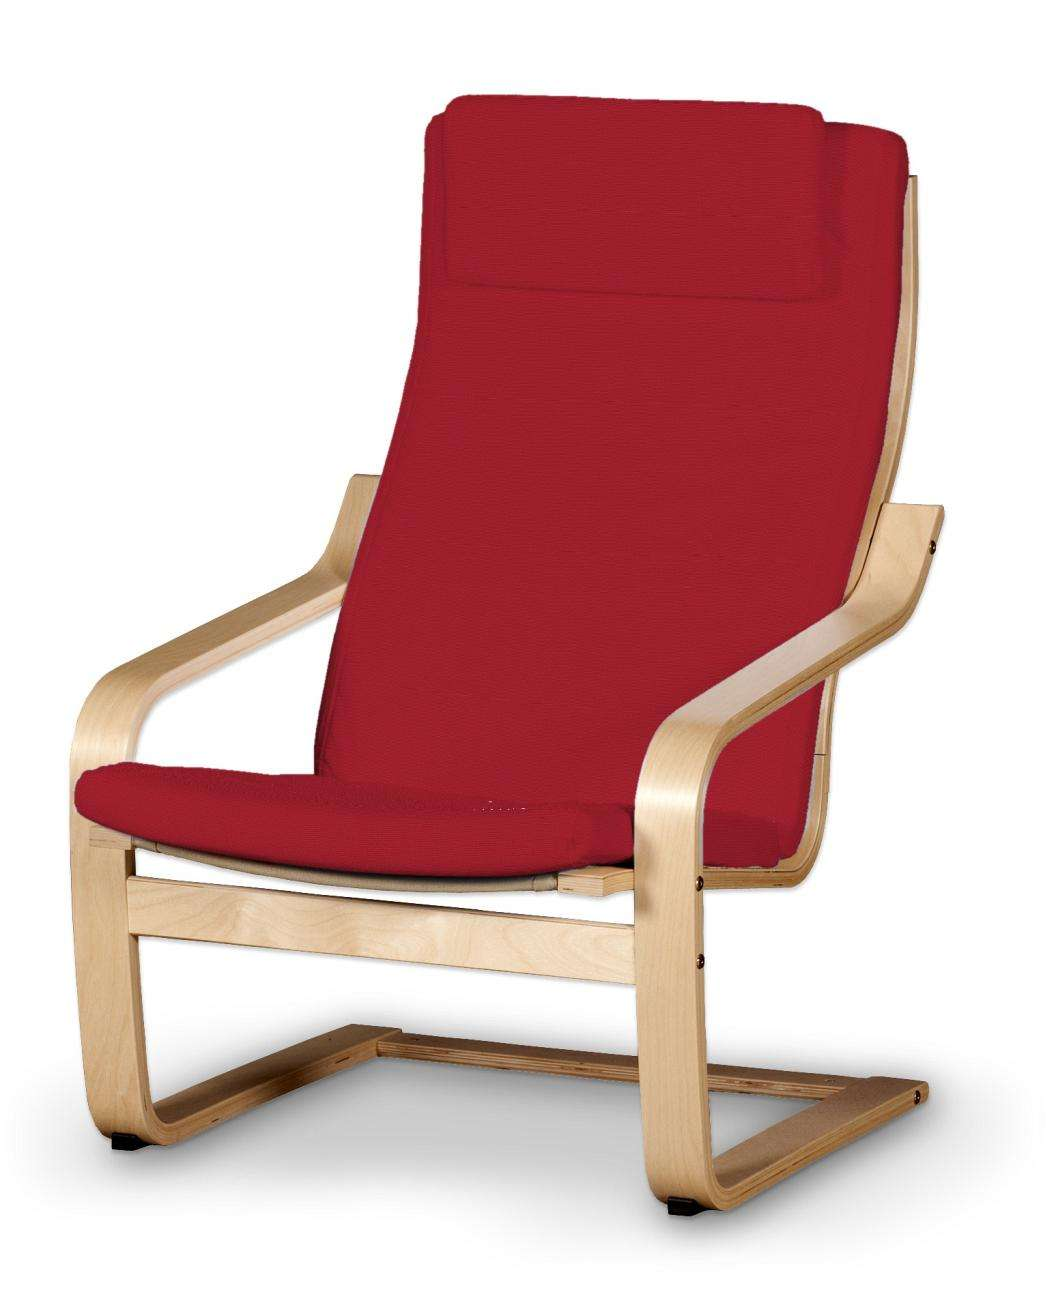 Poduszka na fotel Poäng II Fotel Poäng II w kolekcji Etna , tkanina: 705-60